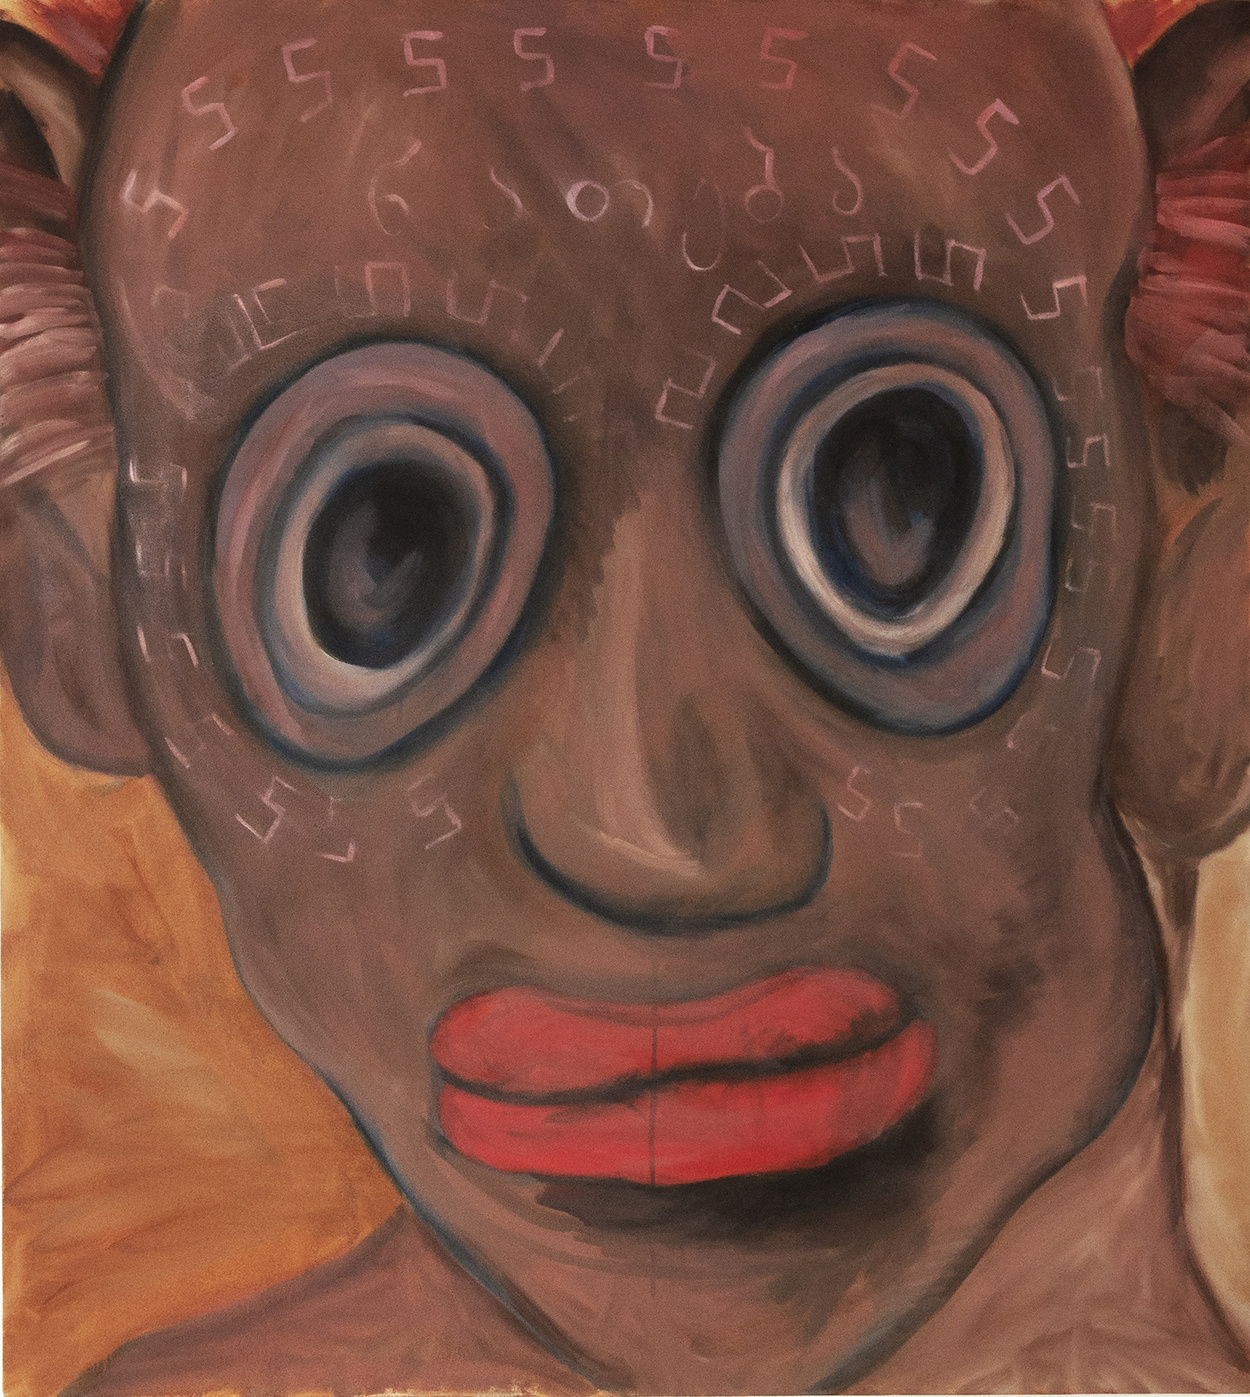 Ria Kacharava 11 #art живопись, искусство, Нью-Йорк, Риа Качарава, сша